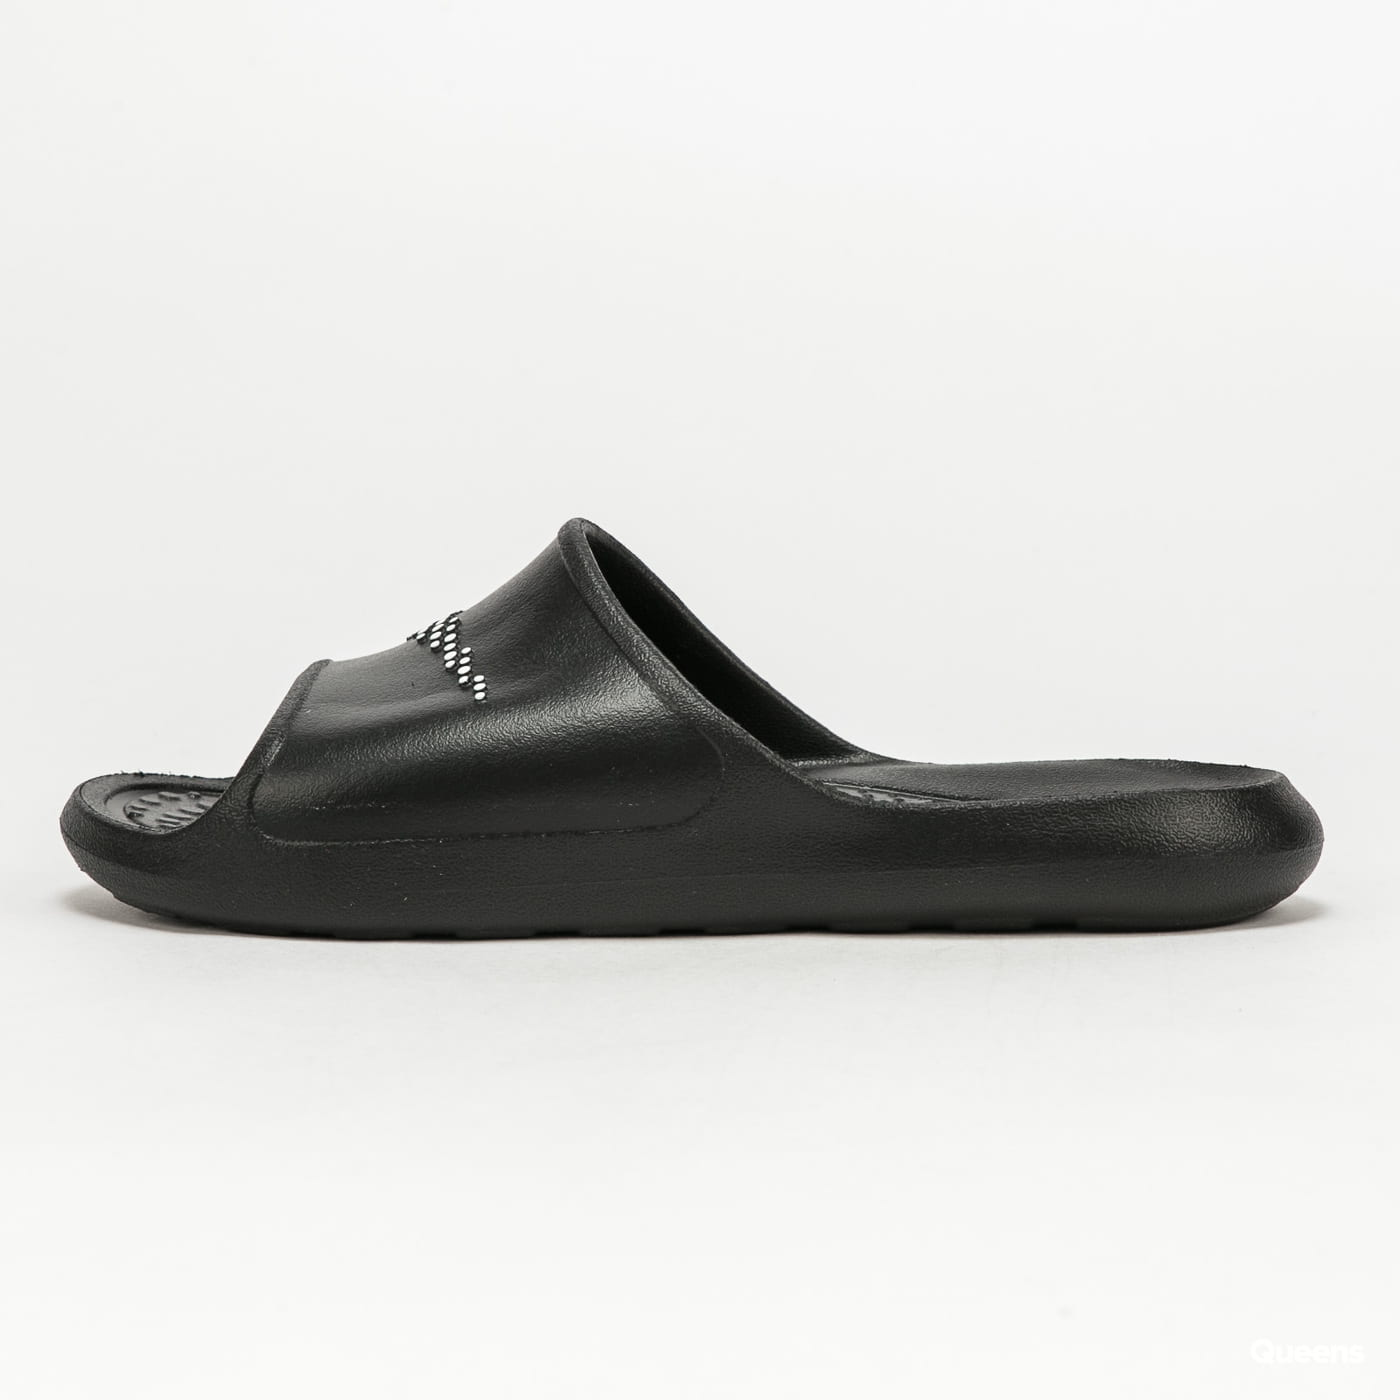 Nike Victori One Shower Slide black / white - black